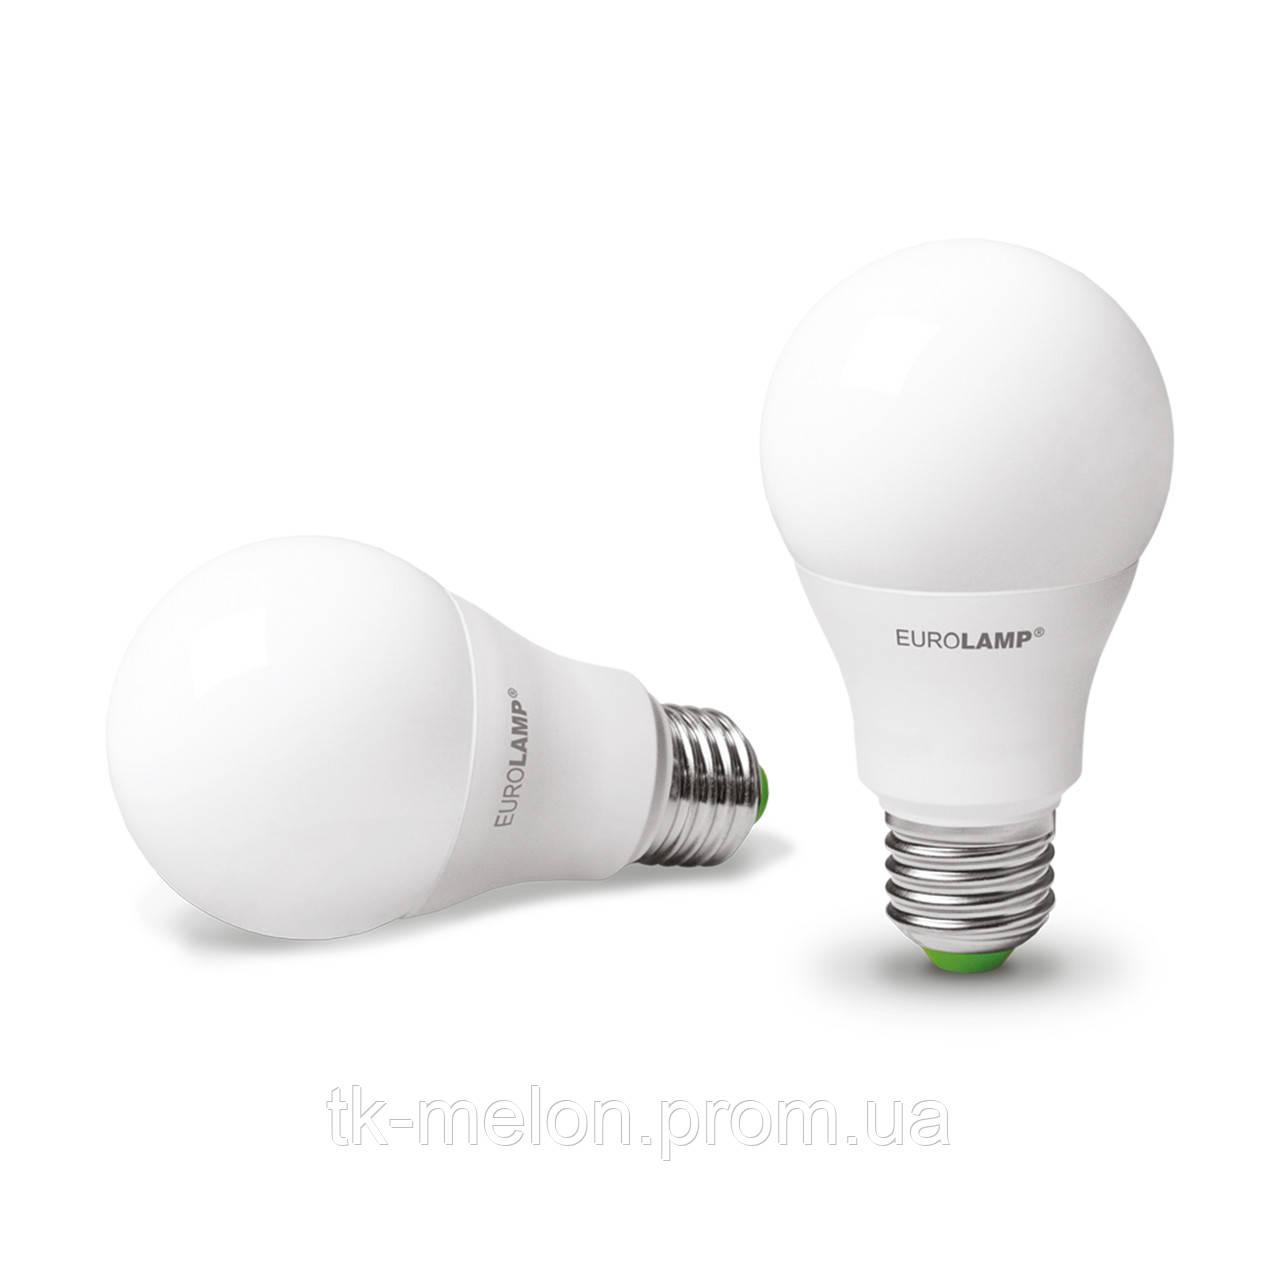 LED Лампа ЕКО A60 10W E27 3000K